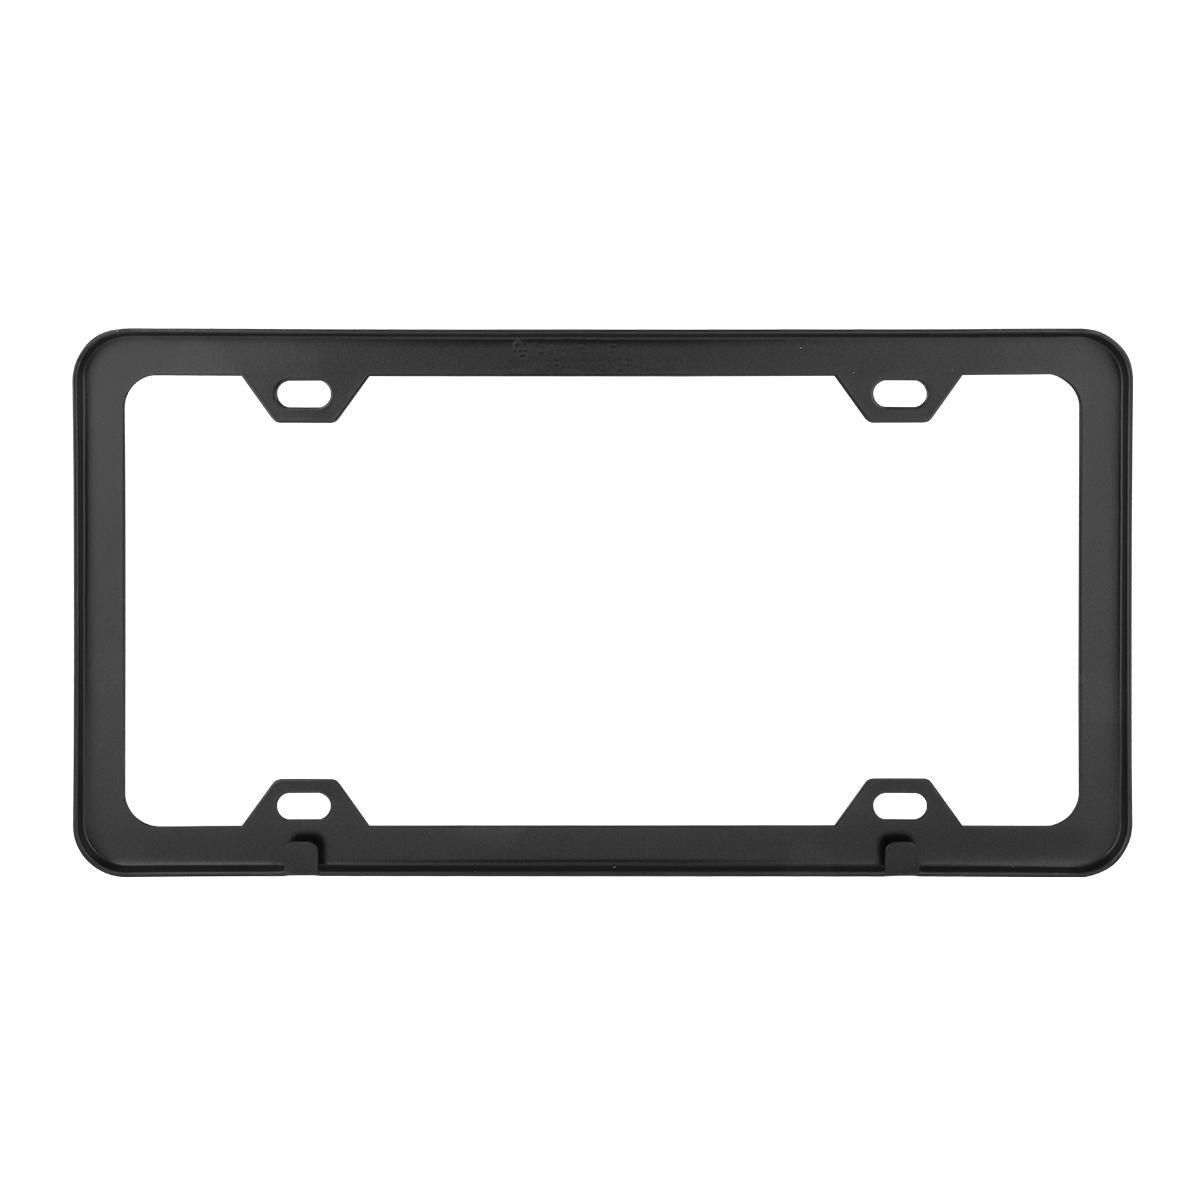 60414 Plain Matte Black 4 Hole License Plate Frame - Back View